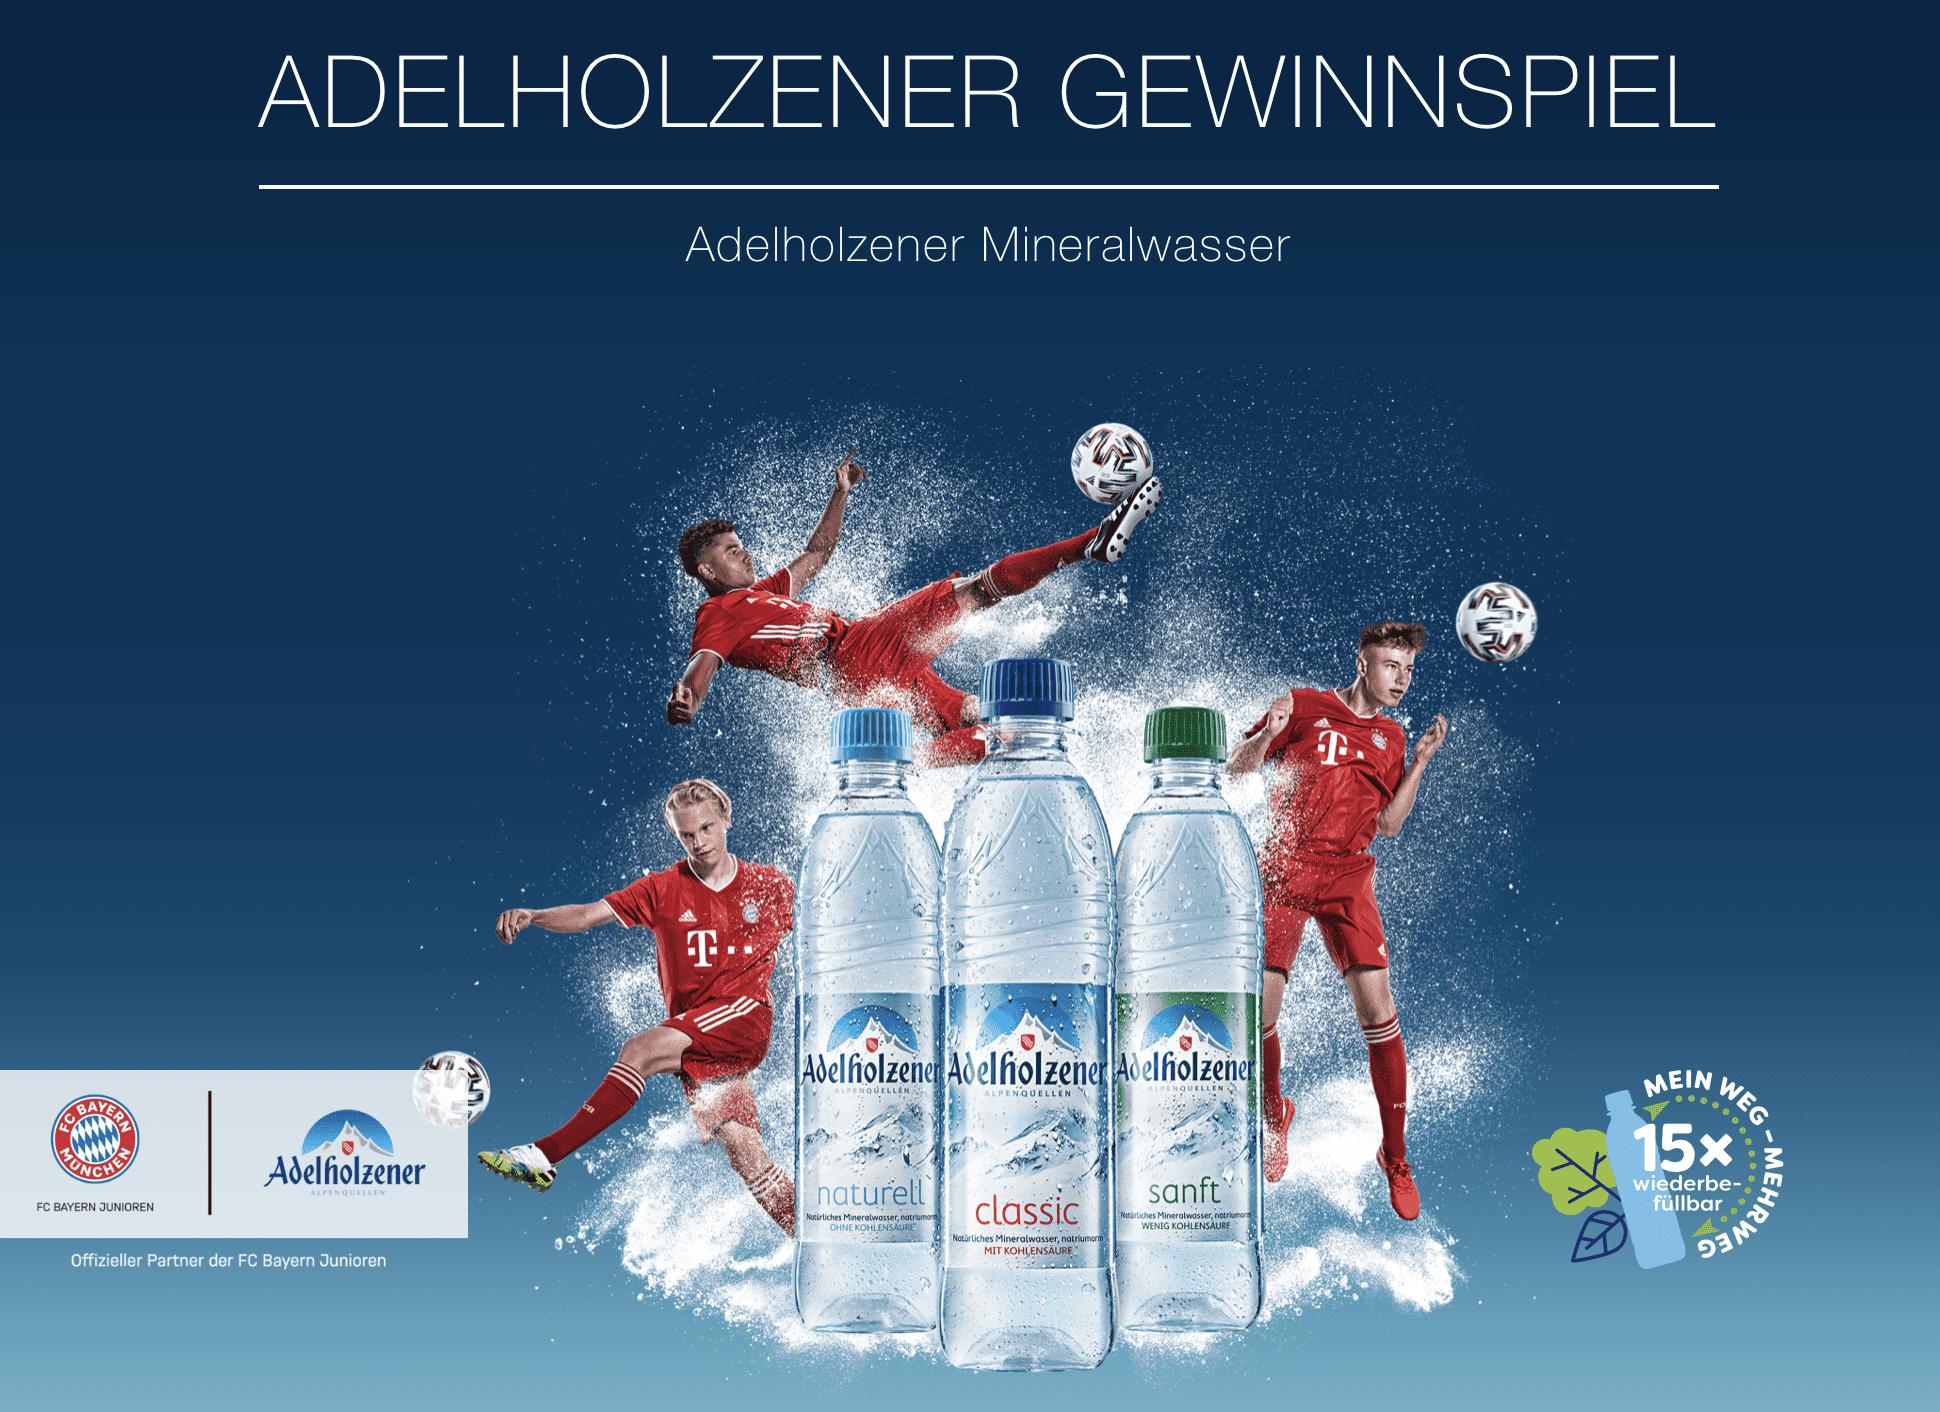 Gewinnspiel-Cases FMCG Getränke Adelholzener